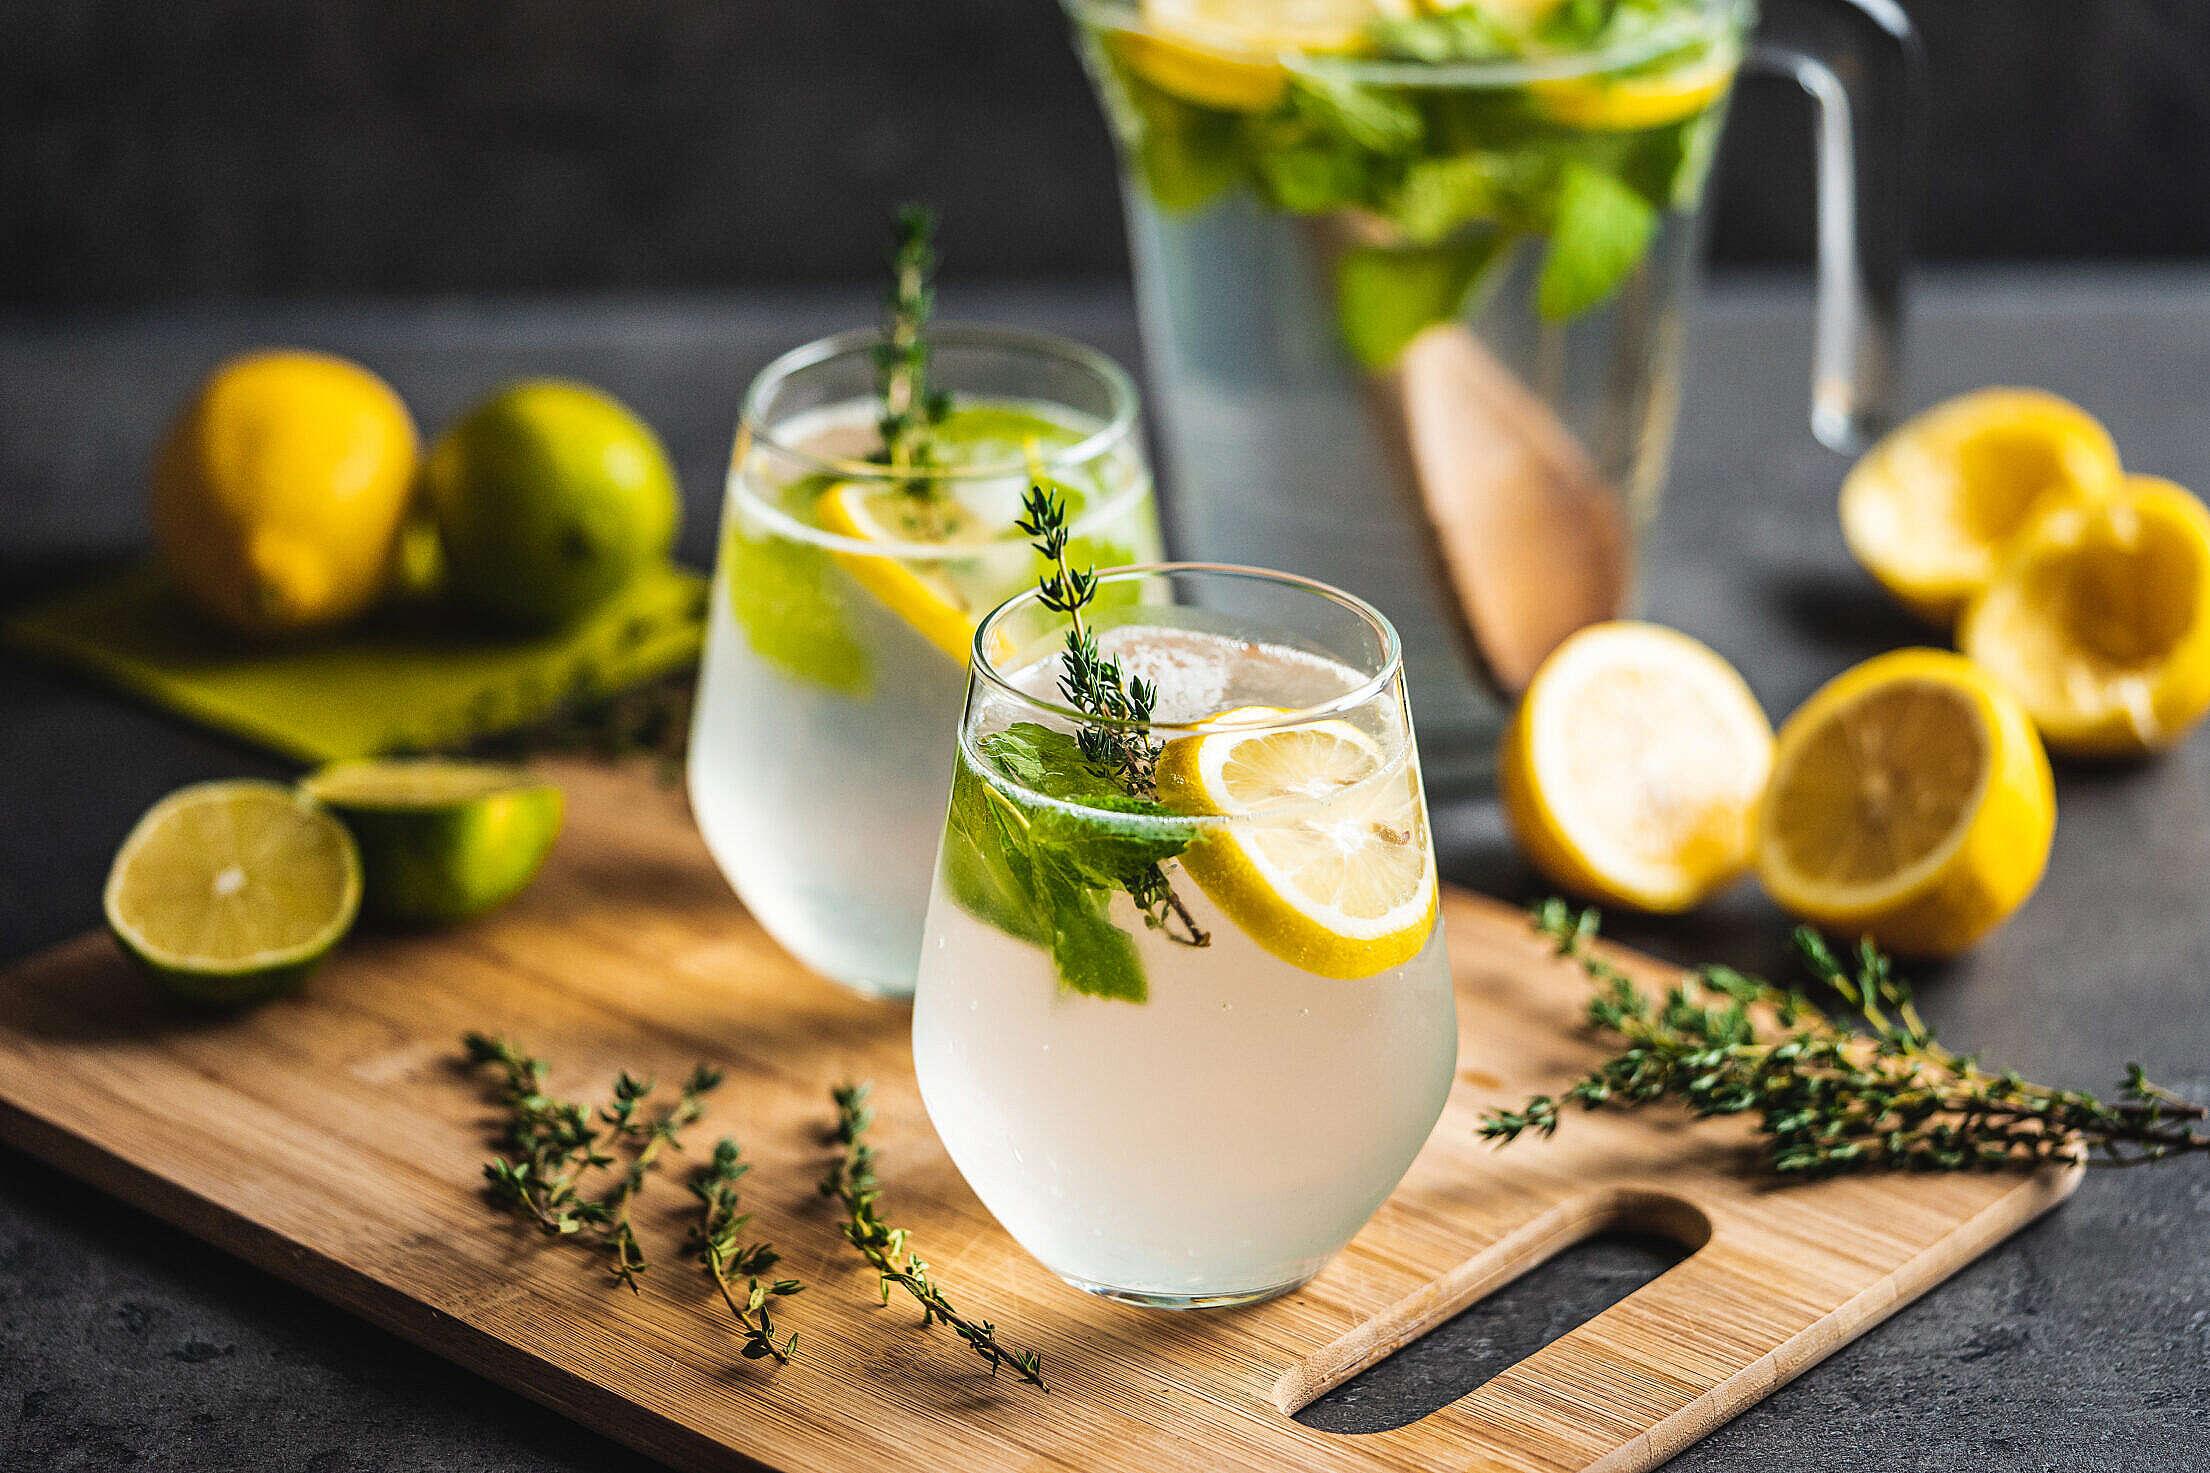 Lemon Drink Free Stock Photo